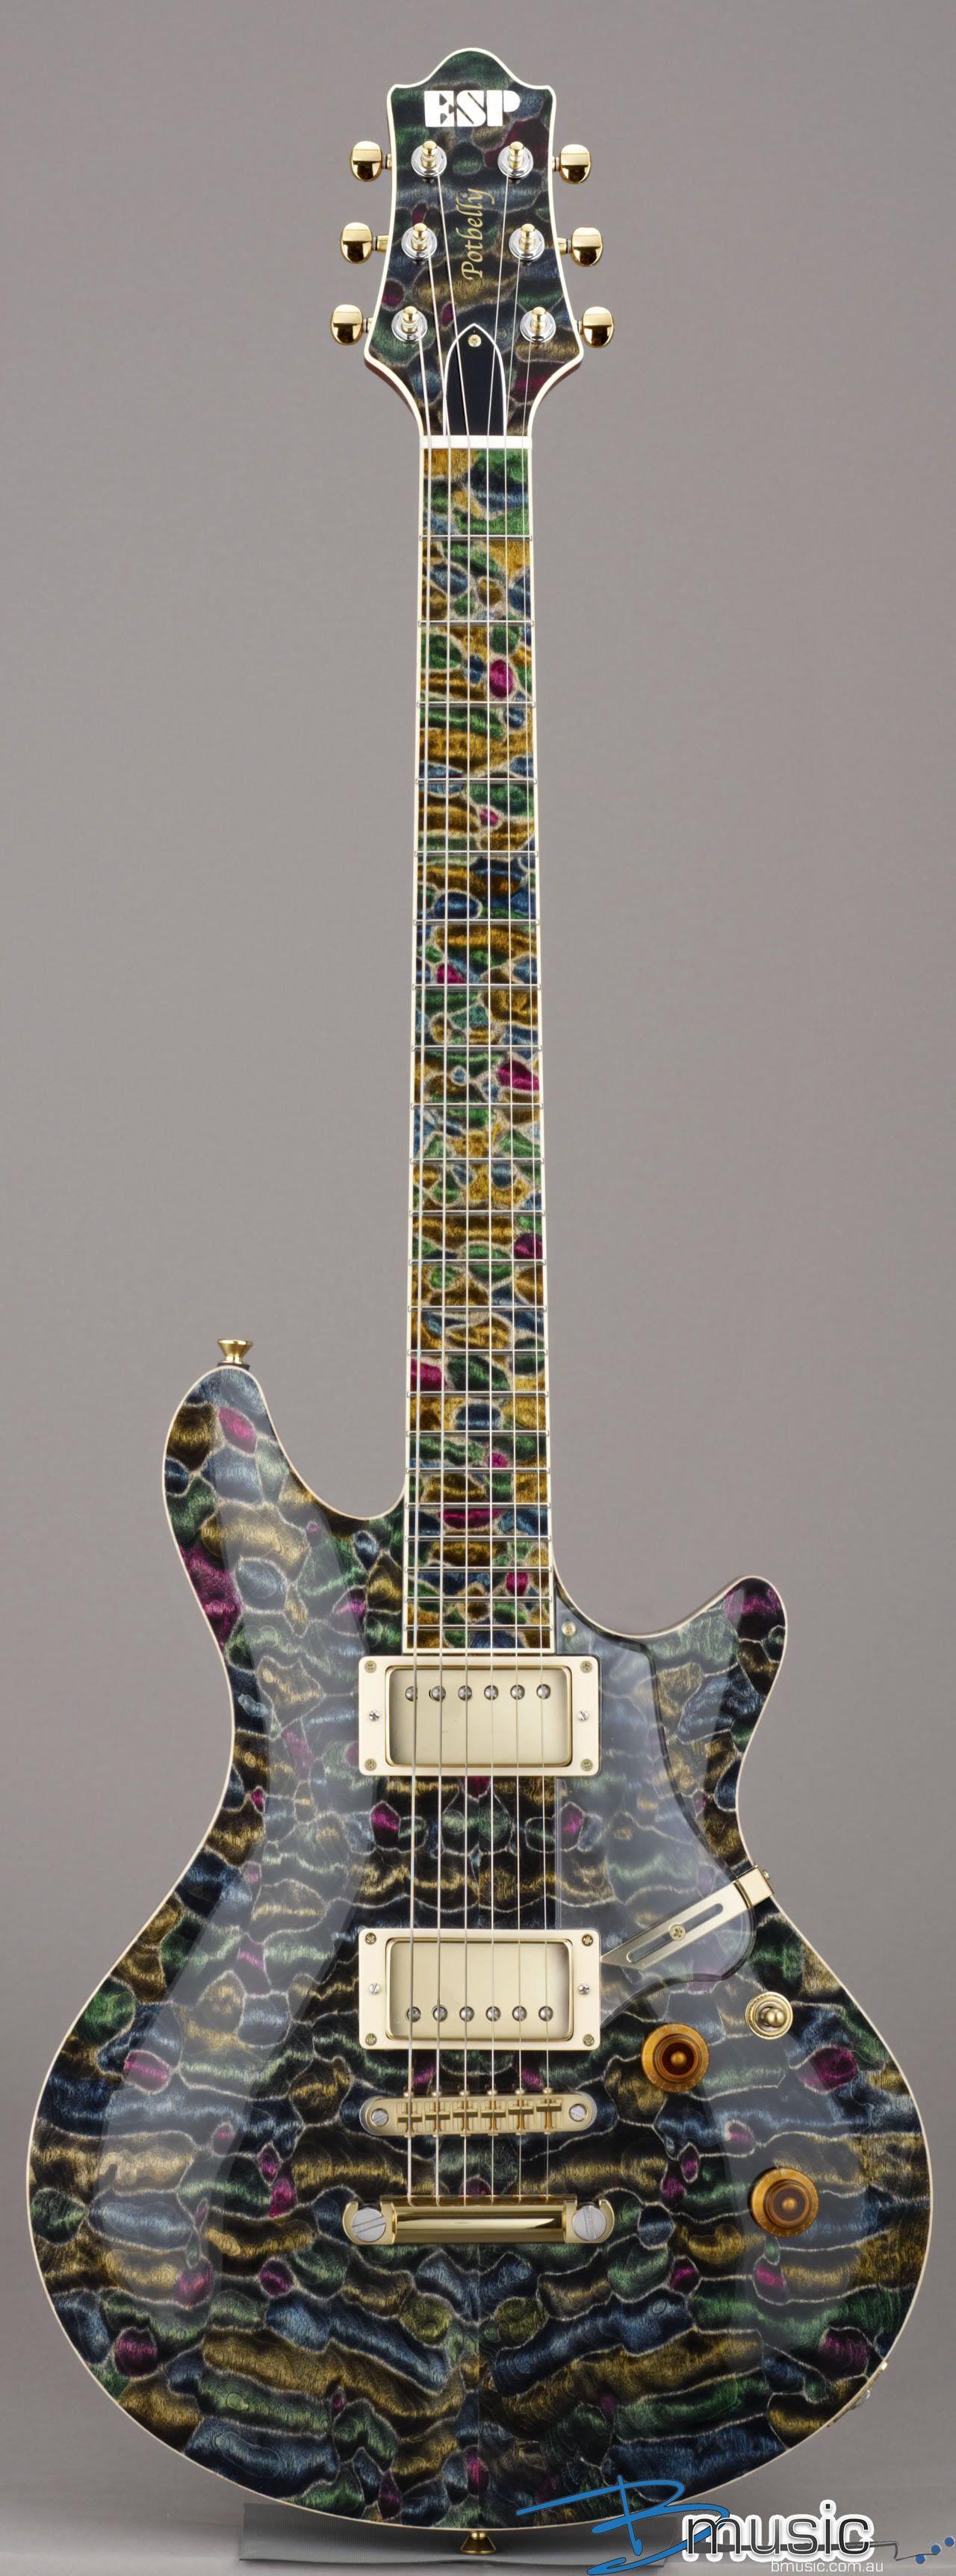 Esp potbellyqm mosaic guitar instrument music